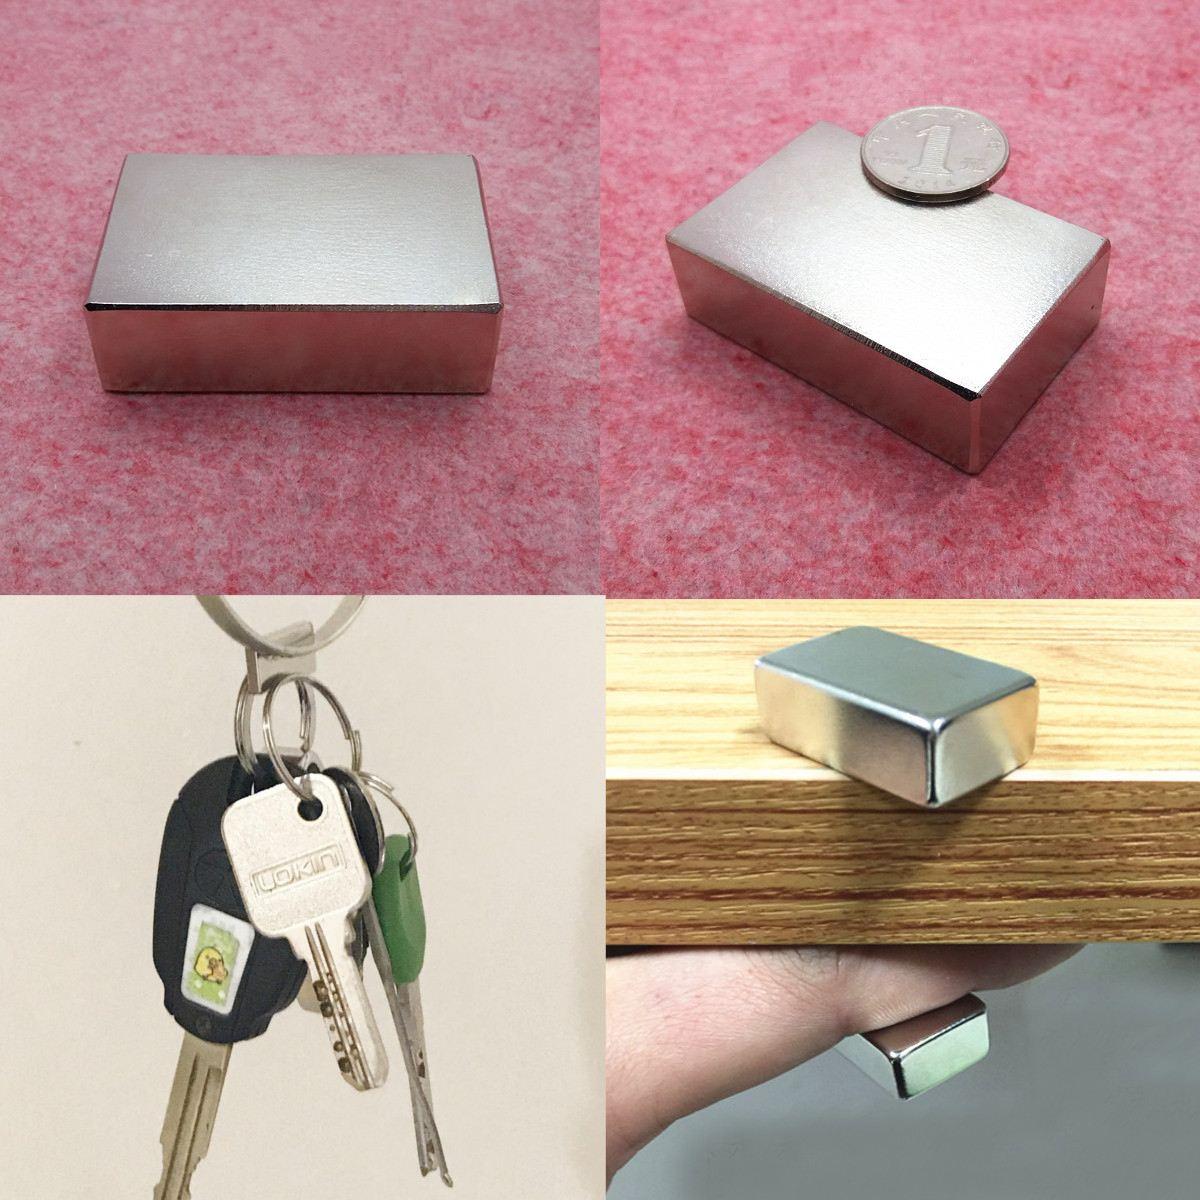 New N52 1pcs Huge Neodymium Block Magnet Permanent Super Strong Fridge Rare Earth Magnets Cuboid Magnetic Materials 60x40x20mm